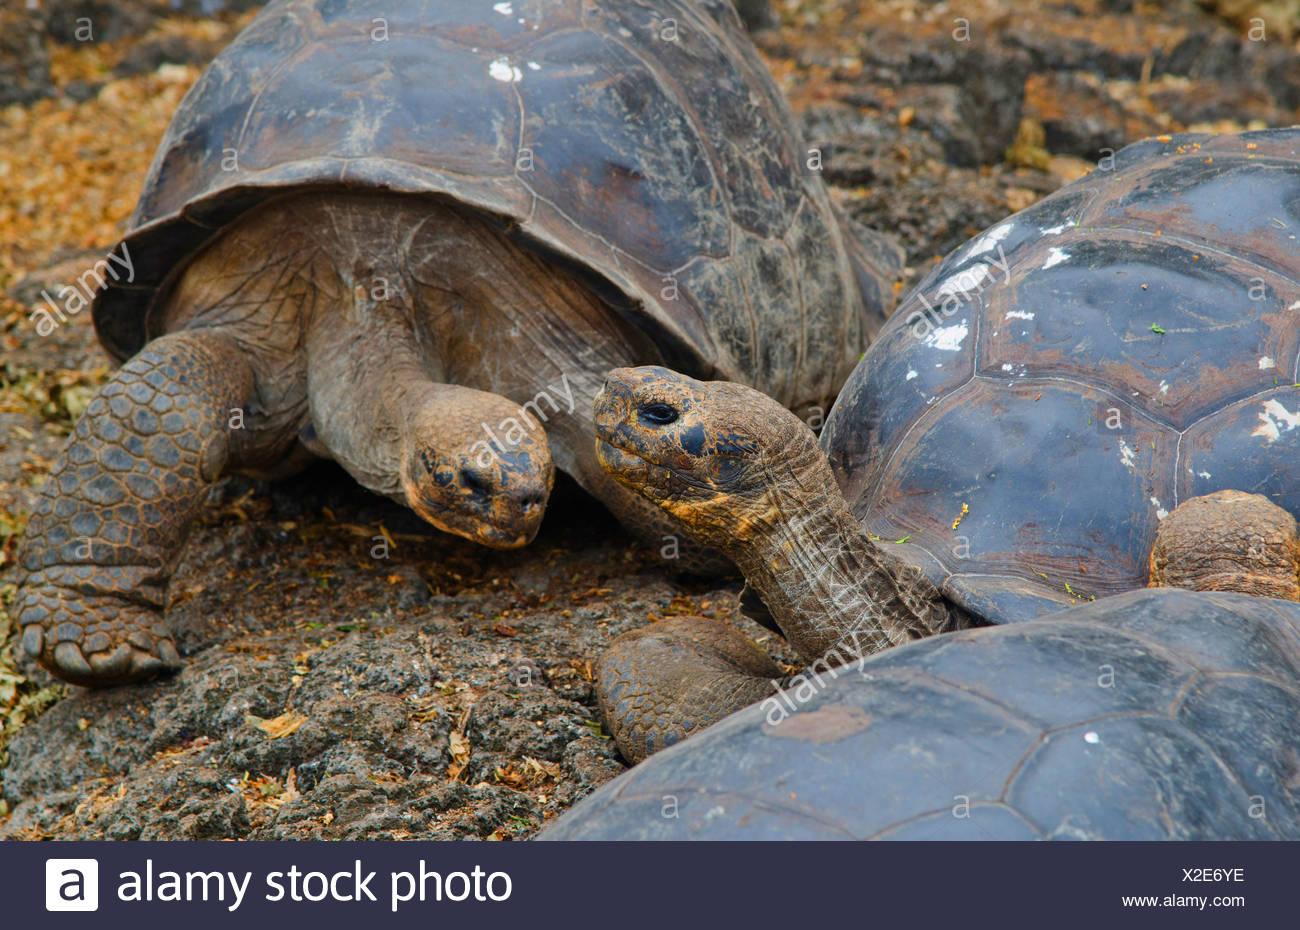 Galapagos-Schildkröte, Galapagos-Riesenschildkröte (Porteri) (Chelonodis Nigra Porteri, Geochelone Elephantopus Porteri, Geochelone Nigra Porteri, Testudo Elephantopus Porteri, Chelonoides Elephantopus Porteri), Galapagos Schildkröten auf einem Felsen, Ecuador, Galapagos-Inseln, Santa Cruz, Santa Cruz Highlands Stockbild